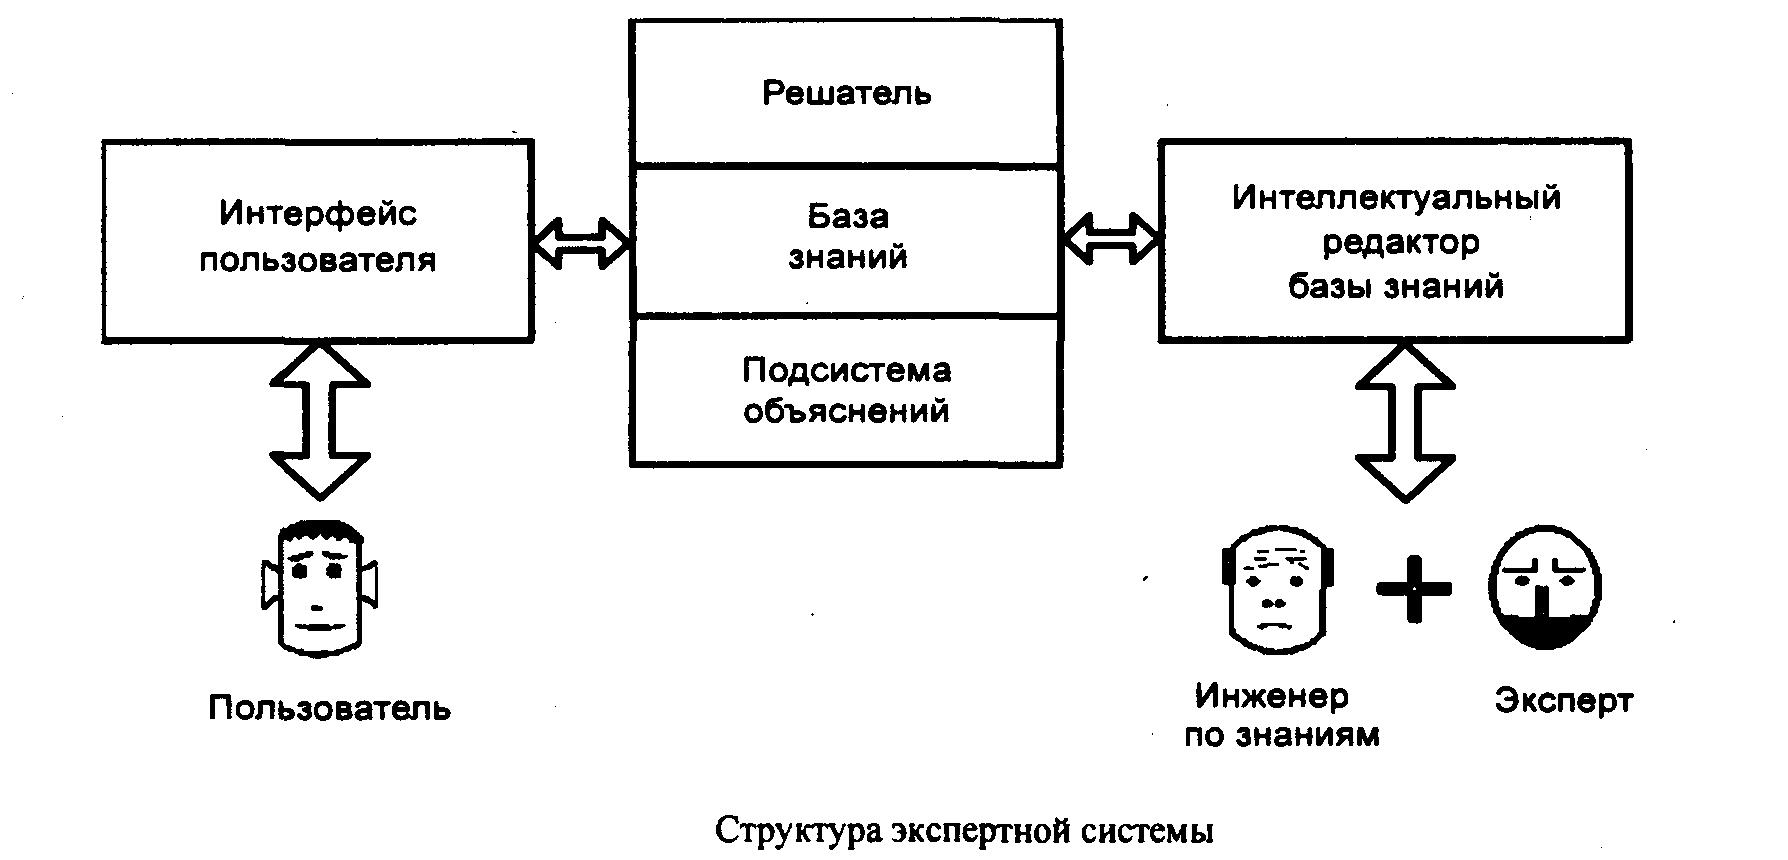 Экспертная система - expert system - qwe.wiki